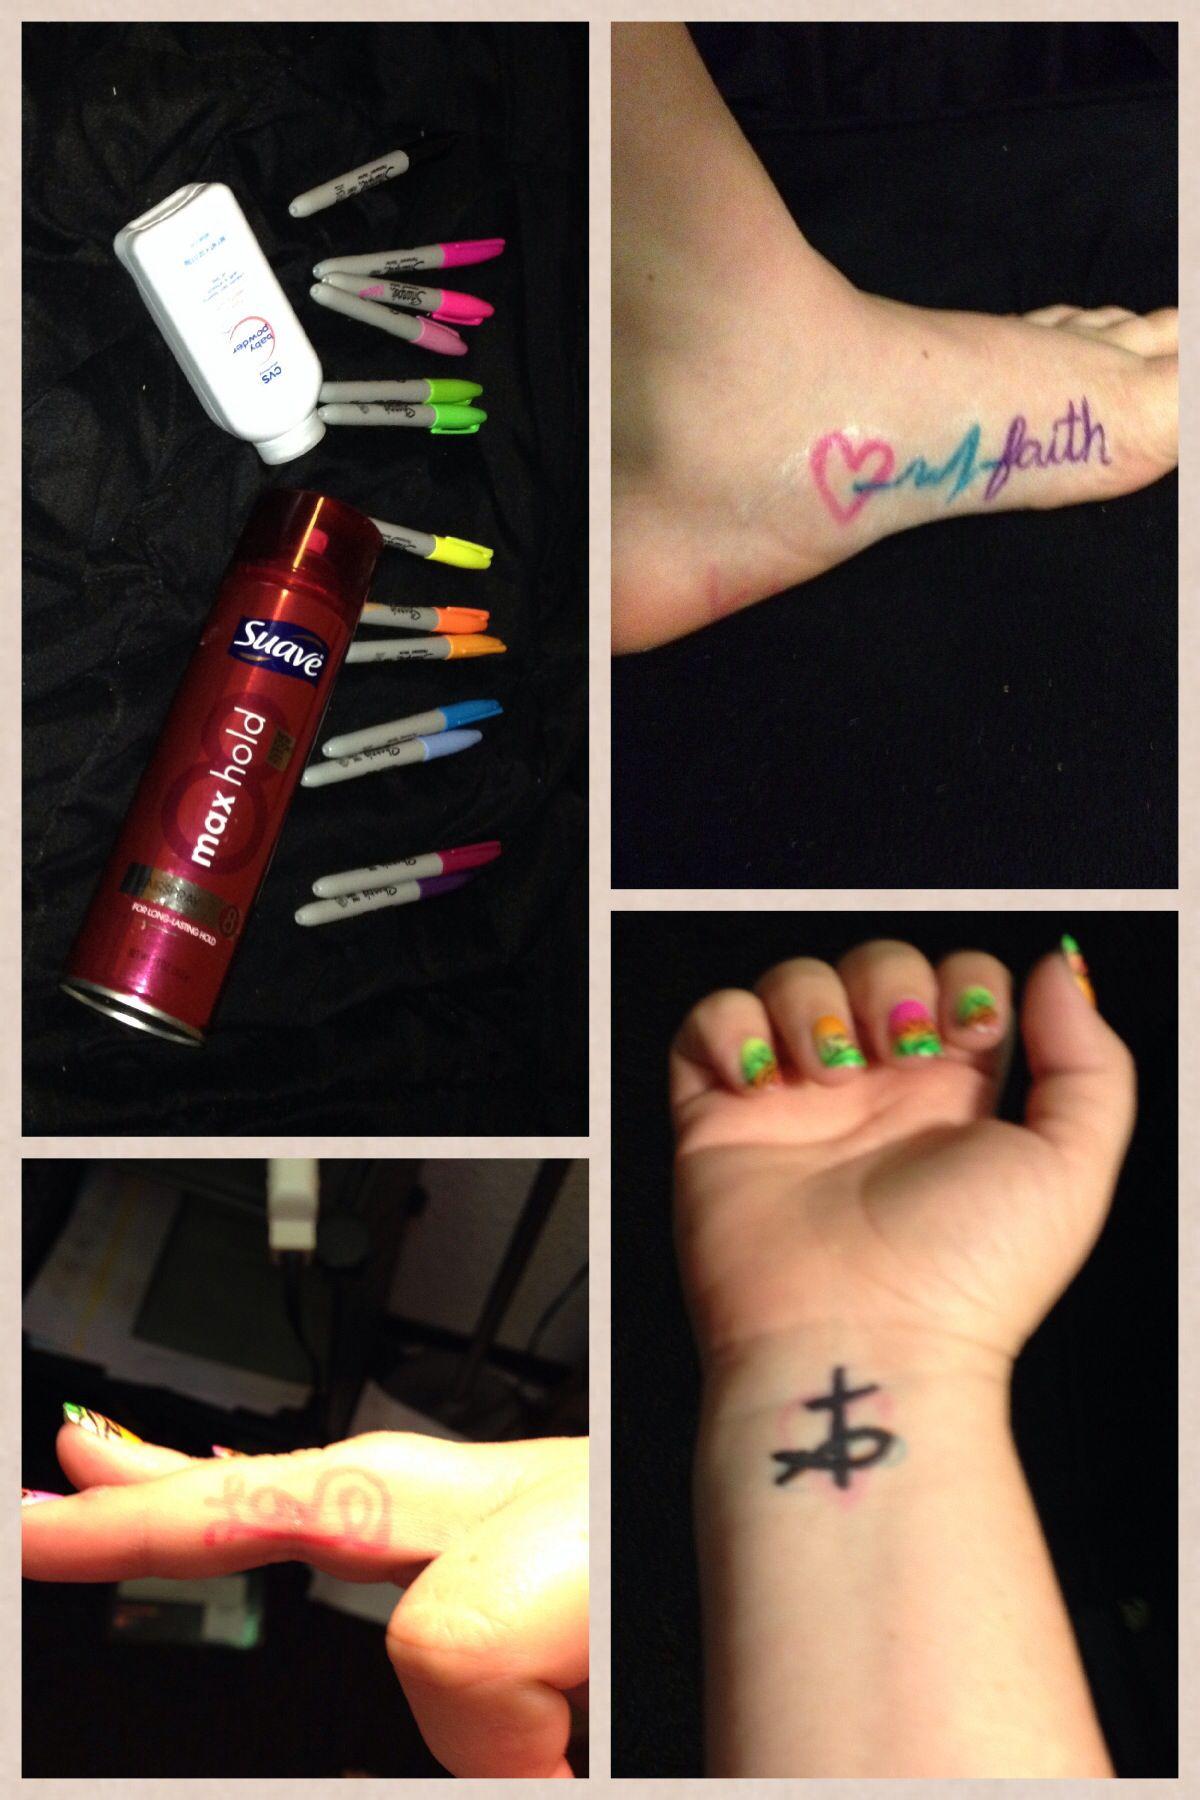 How To Make Sharpie Tattoos Last : sharpie, tattoos, Sharpies,, Powder, Hairspray, Temporary, Tattoos, Month!, Tattoo,, Tattoos,, Tattoo